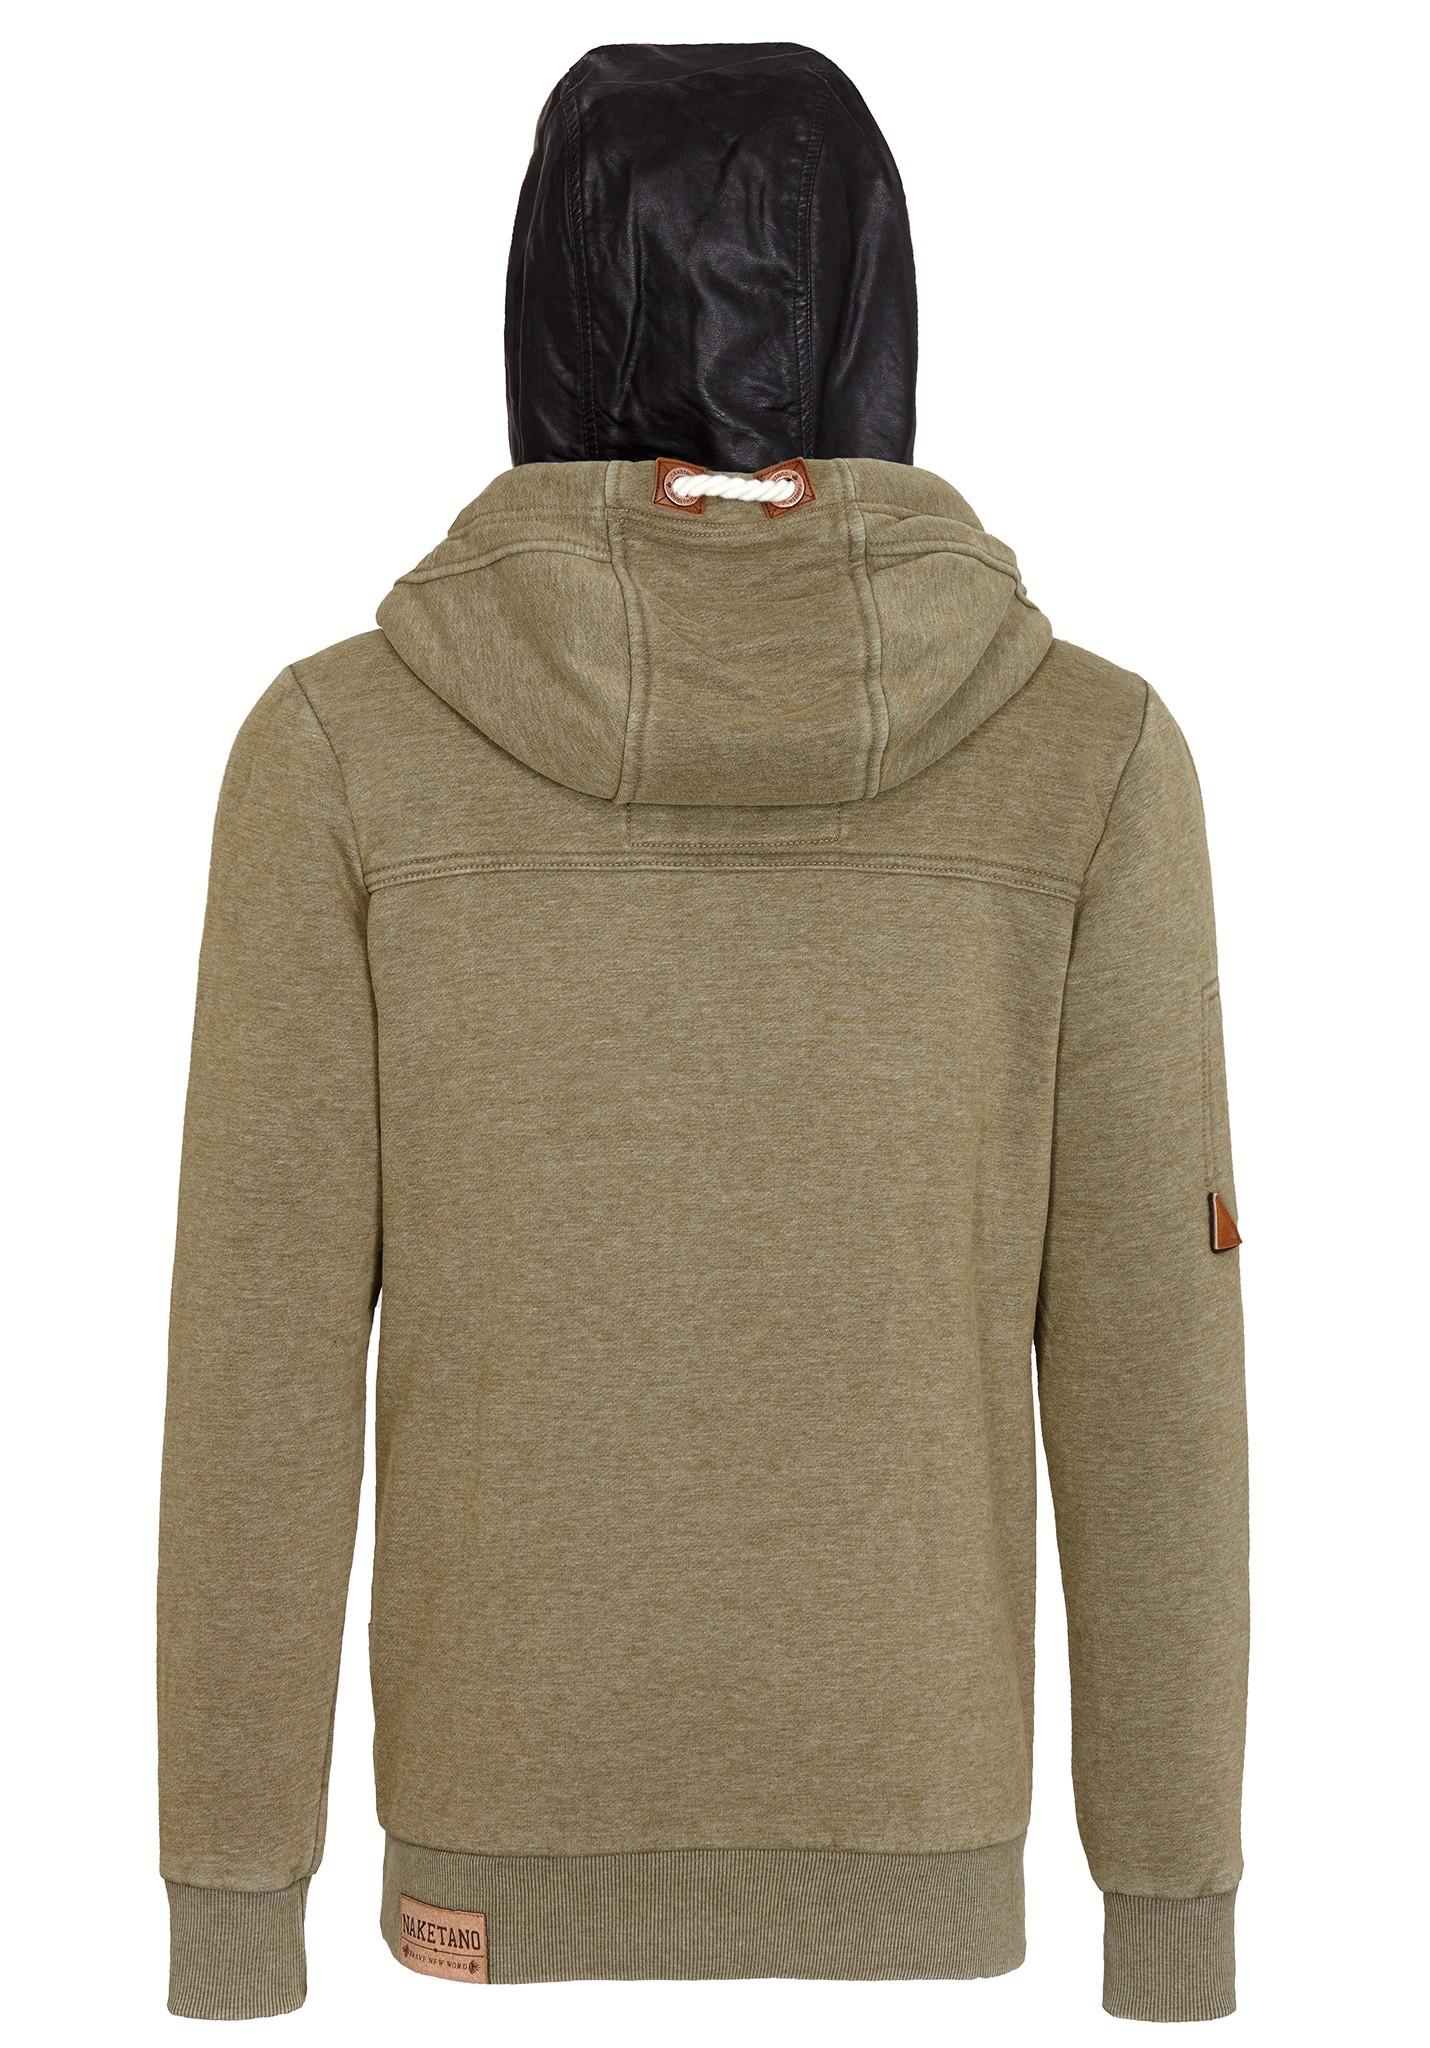 neu naketano der bumser ii herren kapuzenpullover pullover hoodie kapuzenjacke ebay. Black Bedroom Furniture Sets. Home Design Ideas